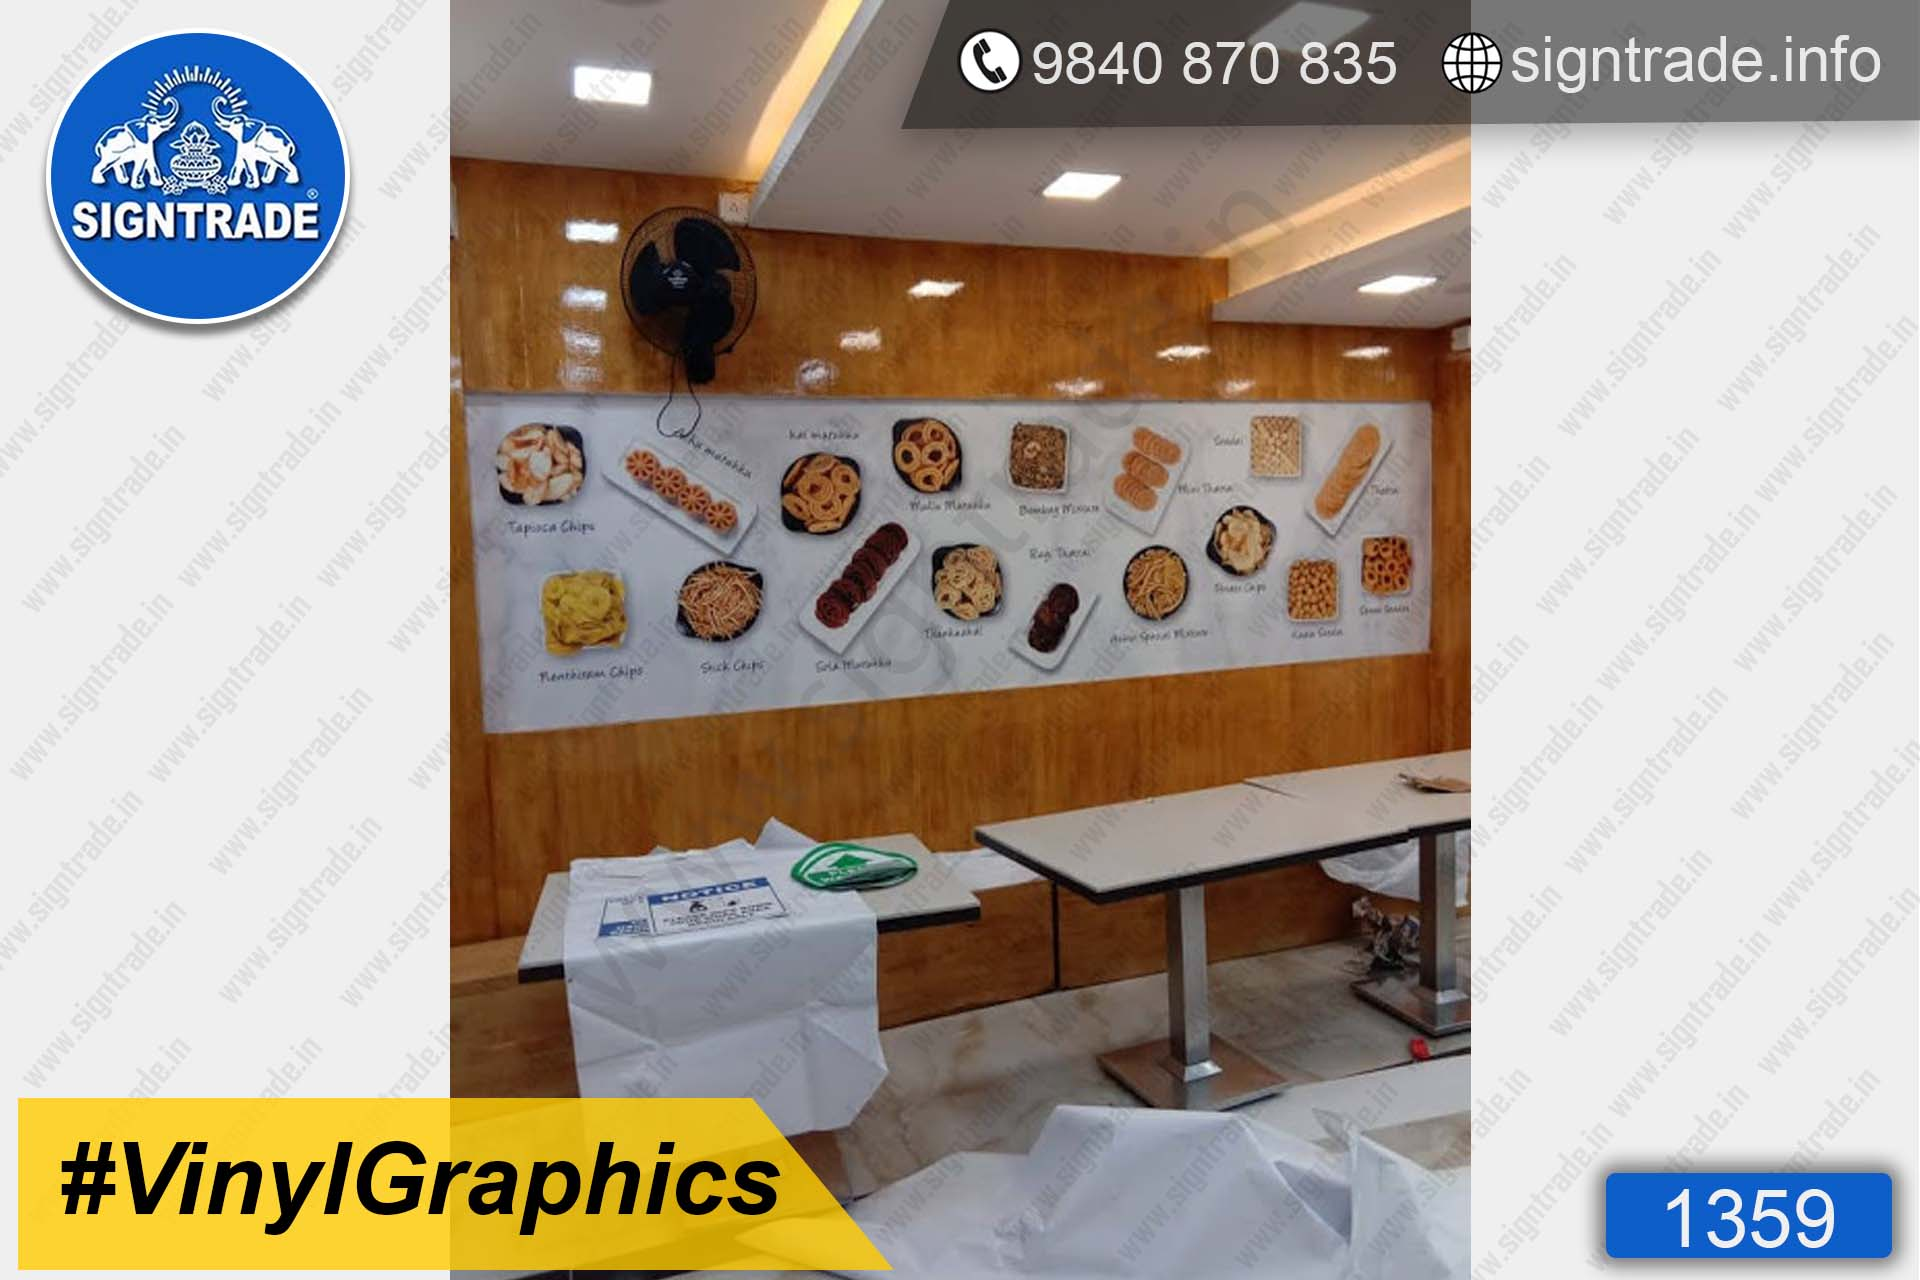 Aswin Sweets and Snacks - Chennai - Vinyl Graphics - SIGNTRADE - Custom Printed Wall Graphics in Chennai